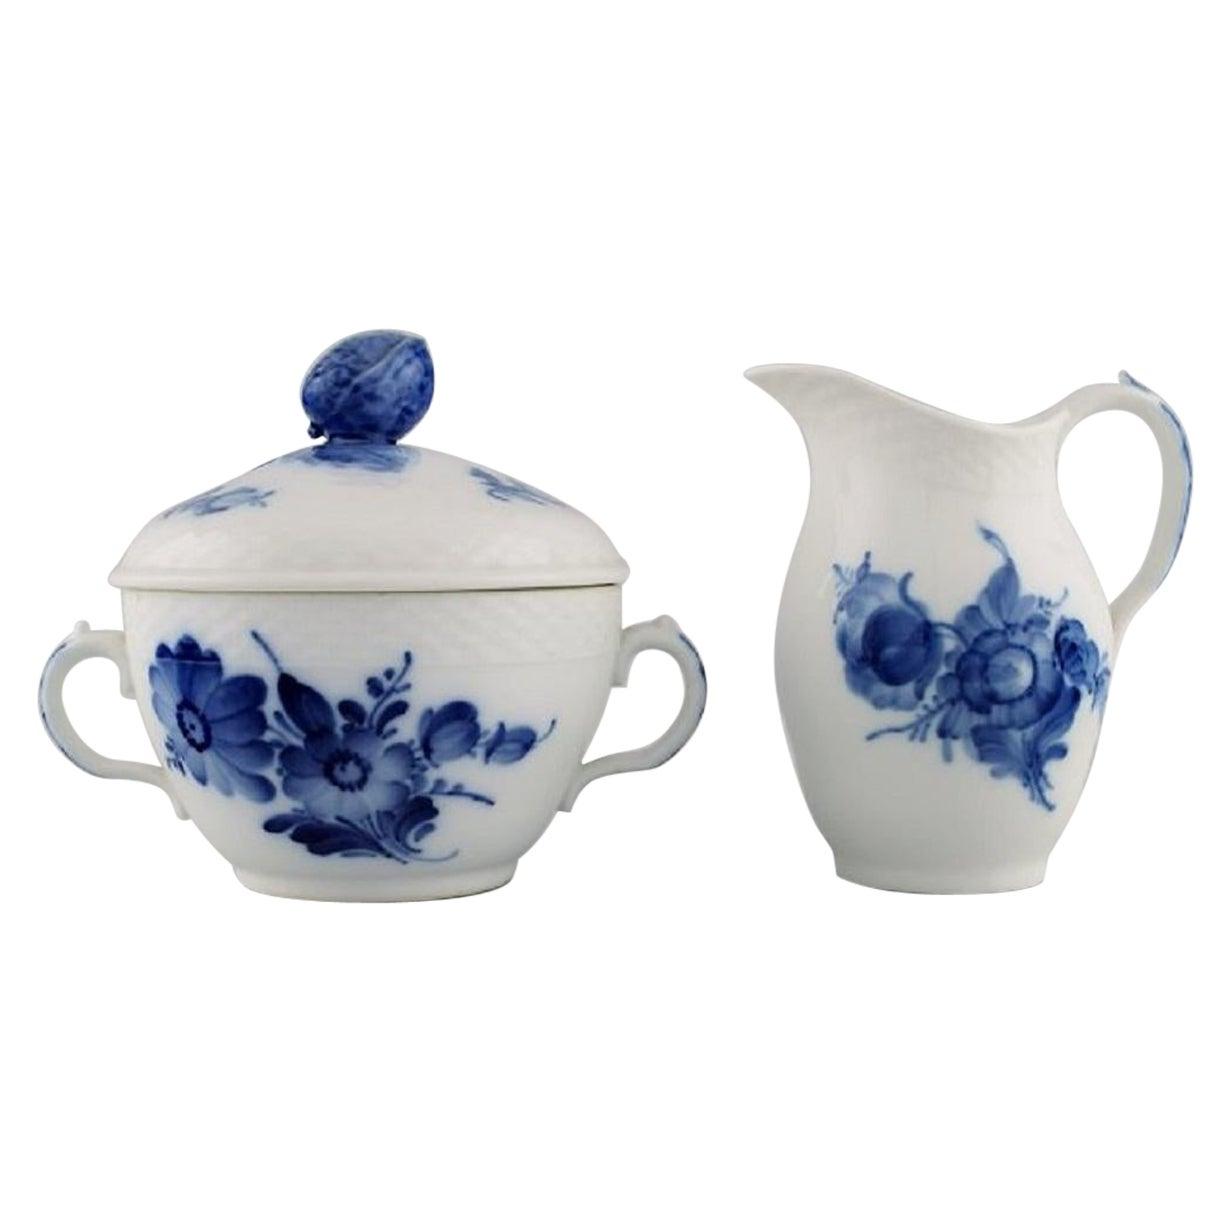 Royal Copenhagen Blue Flower Braided Sugar Bowl and Cream Jug, 1960s